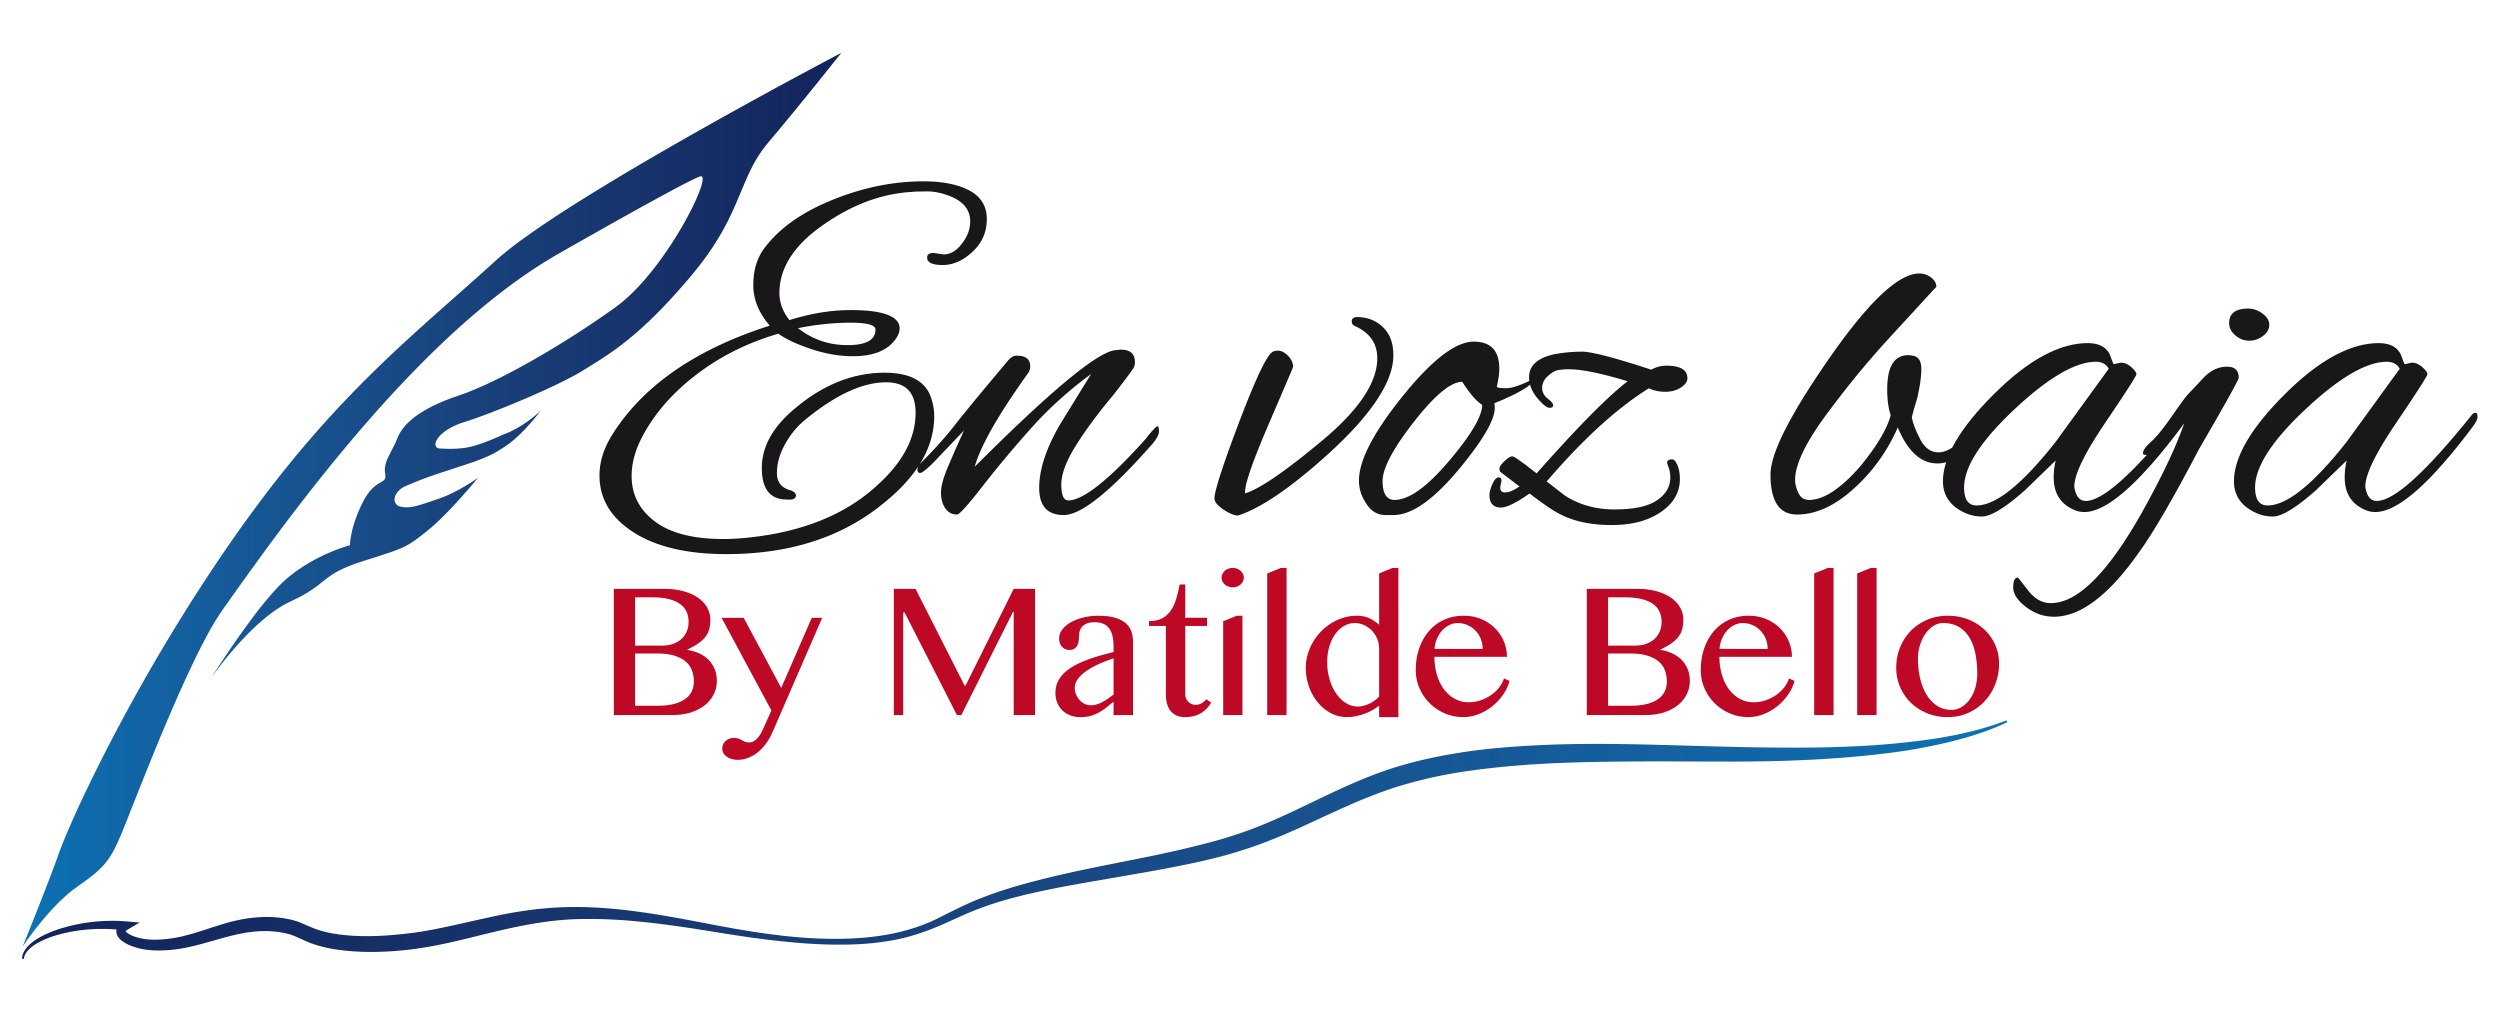 Matilde Bello Escritora y Periodista